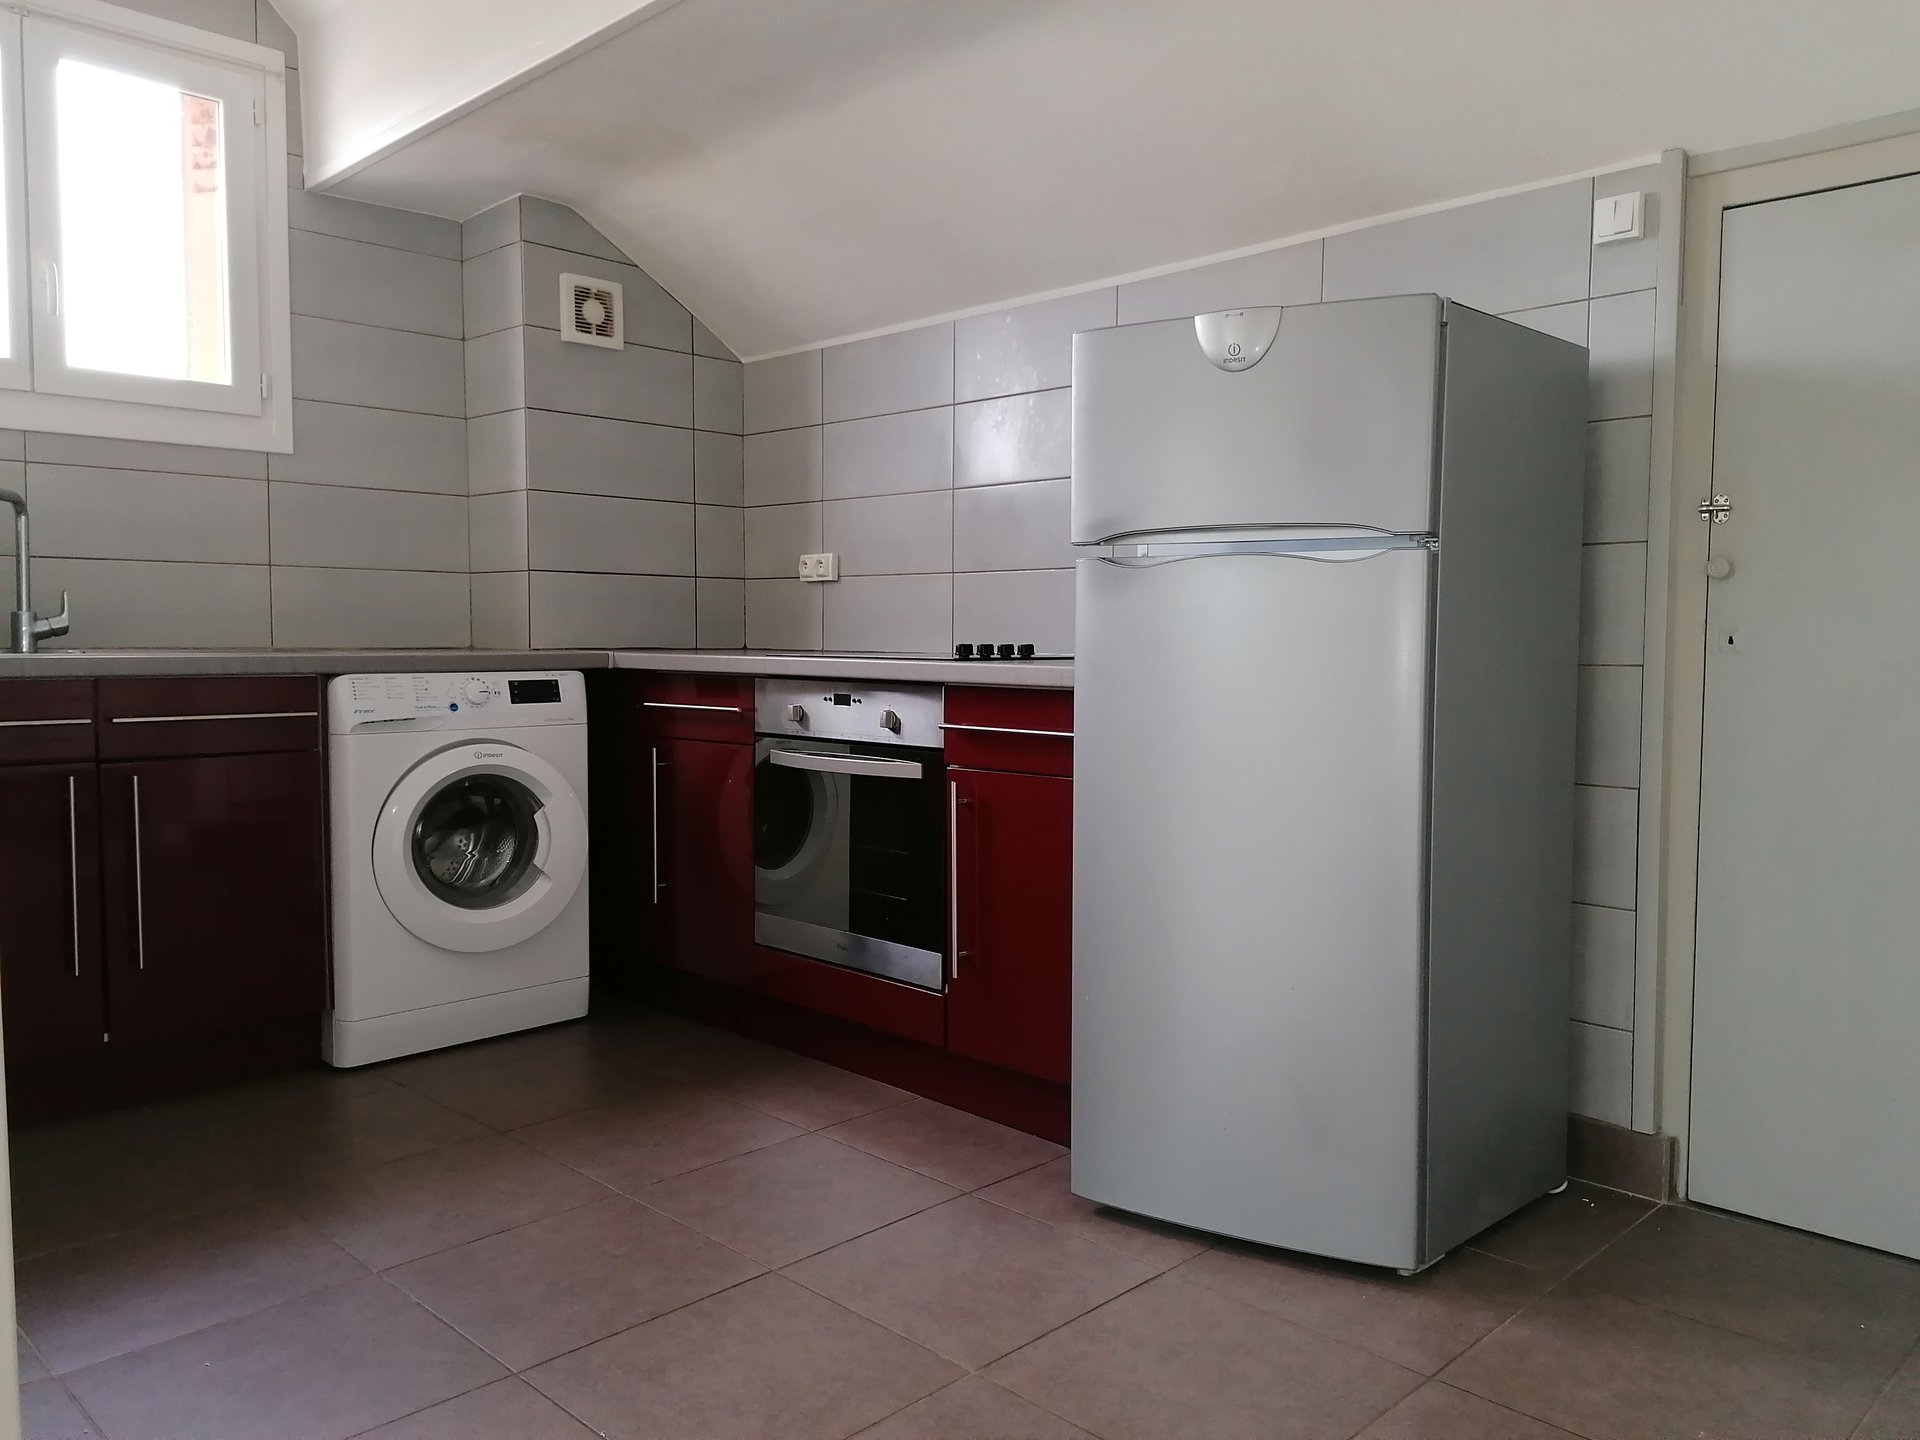 Verkoop Appartement - Aix-les-Bains